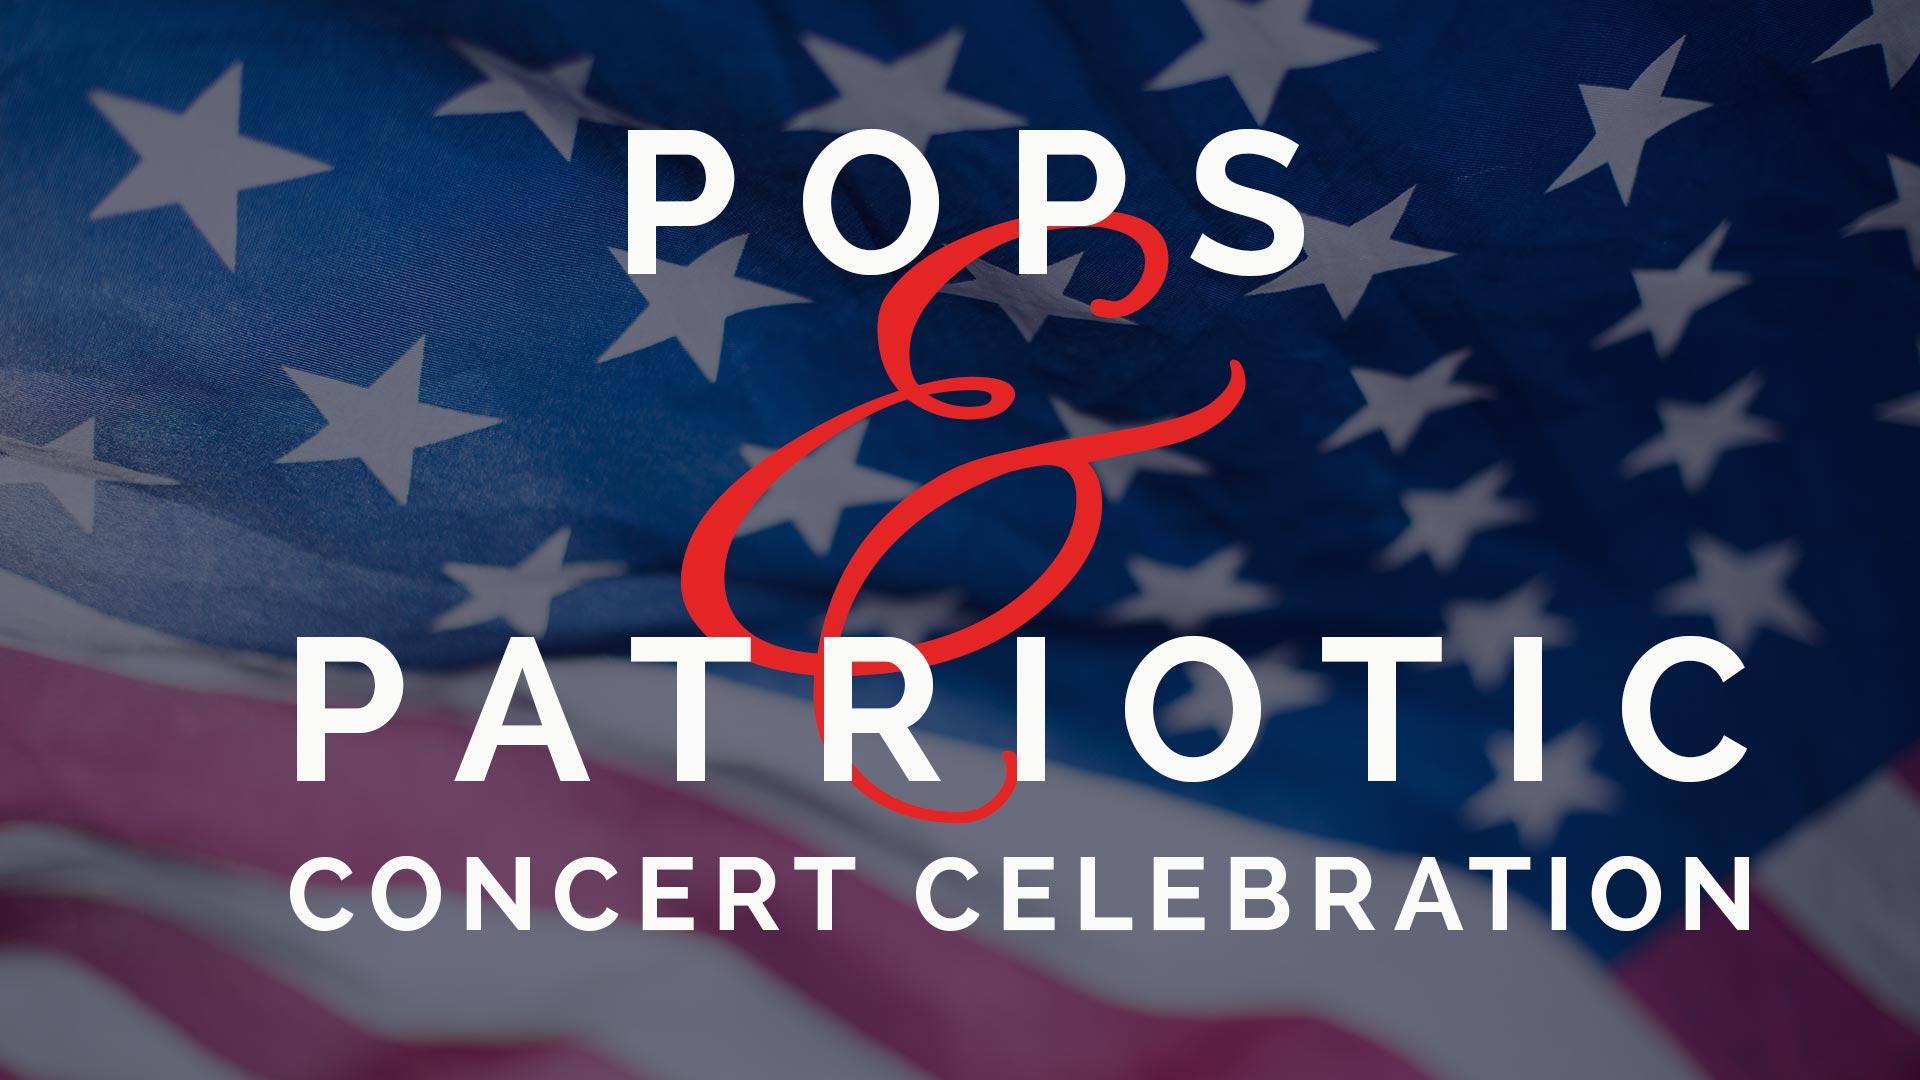 Pops & Patriotic Concert Celebration